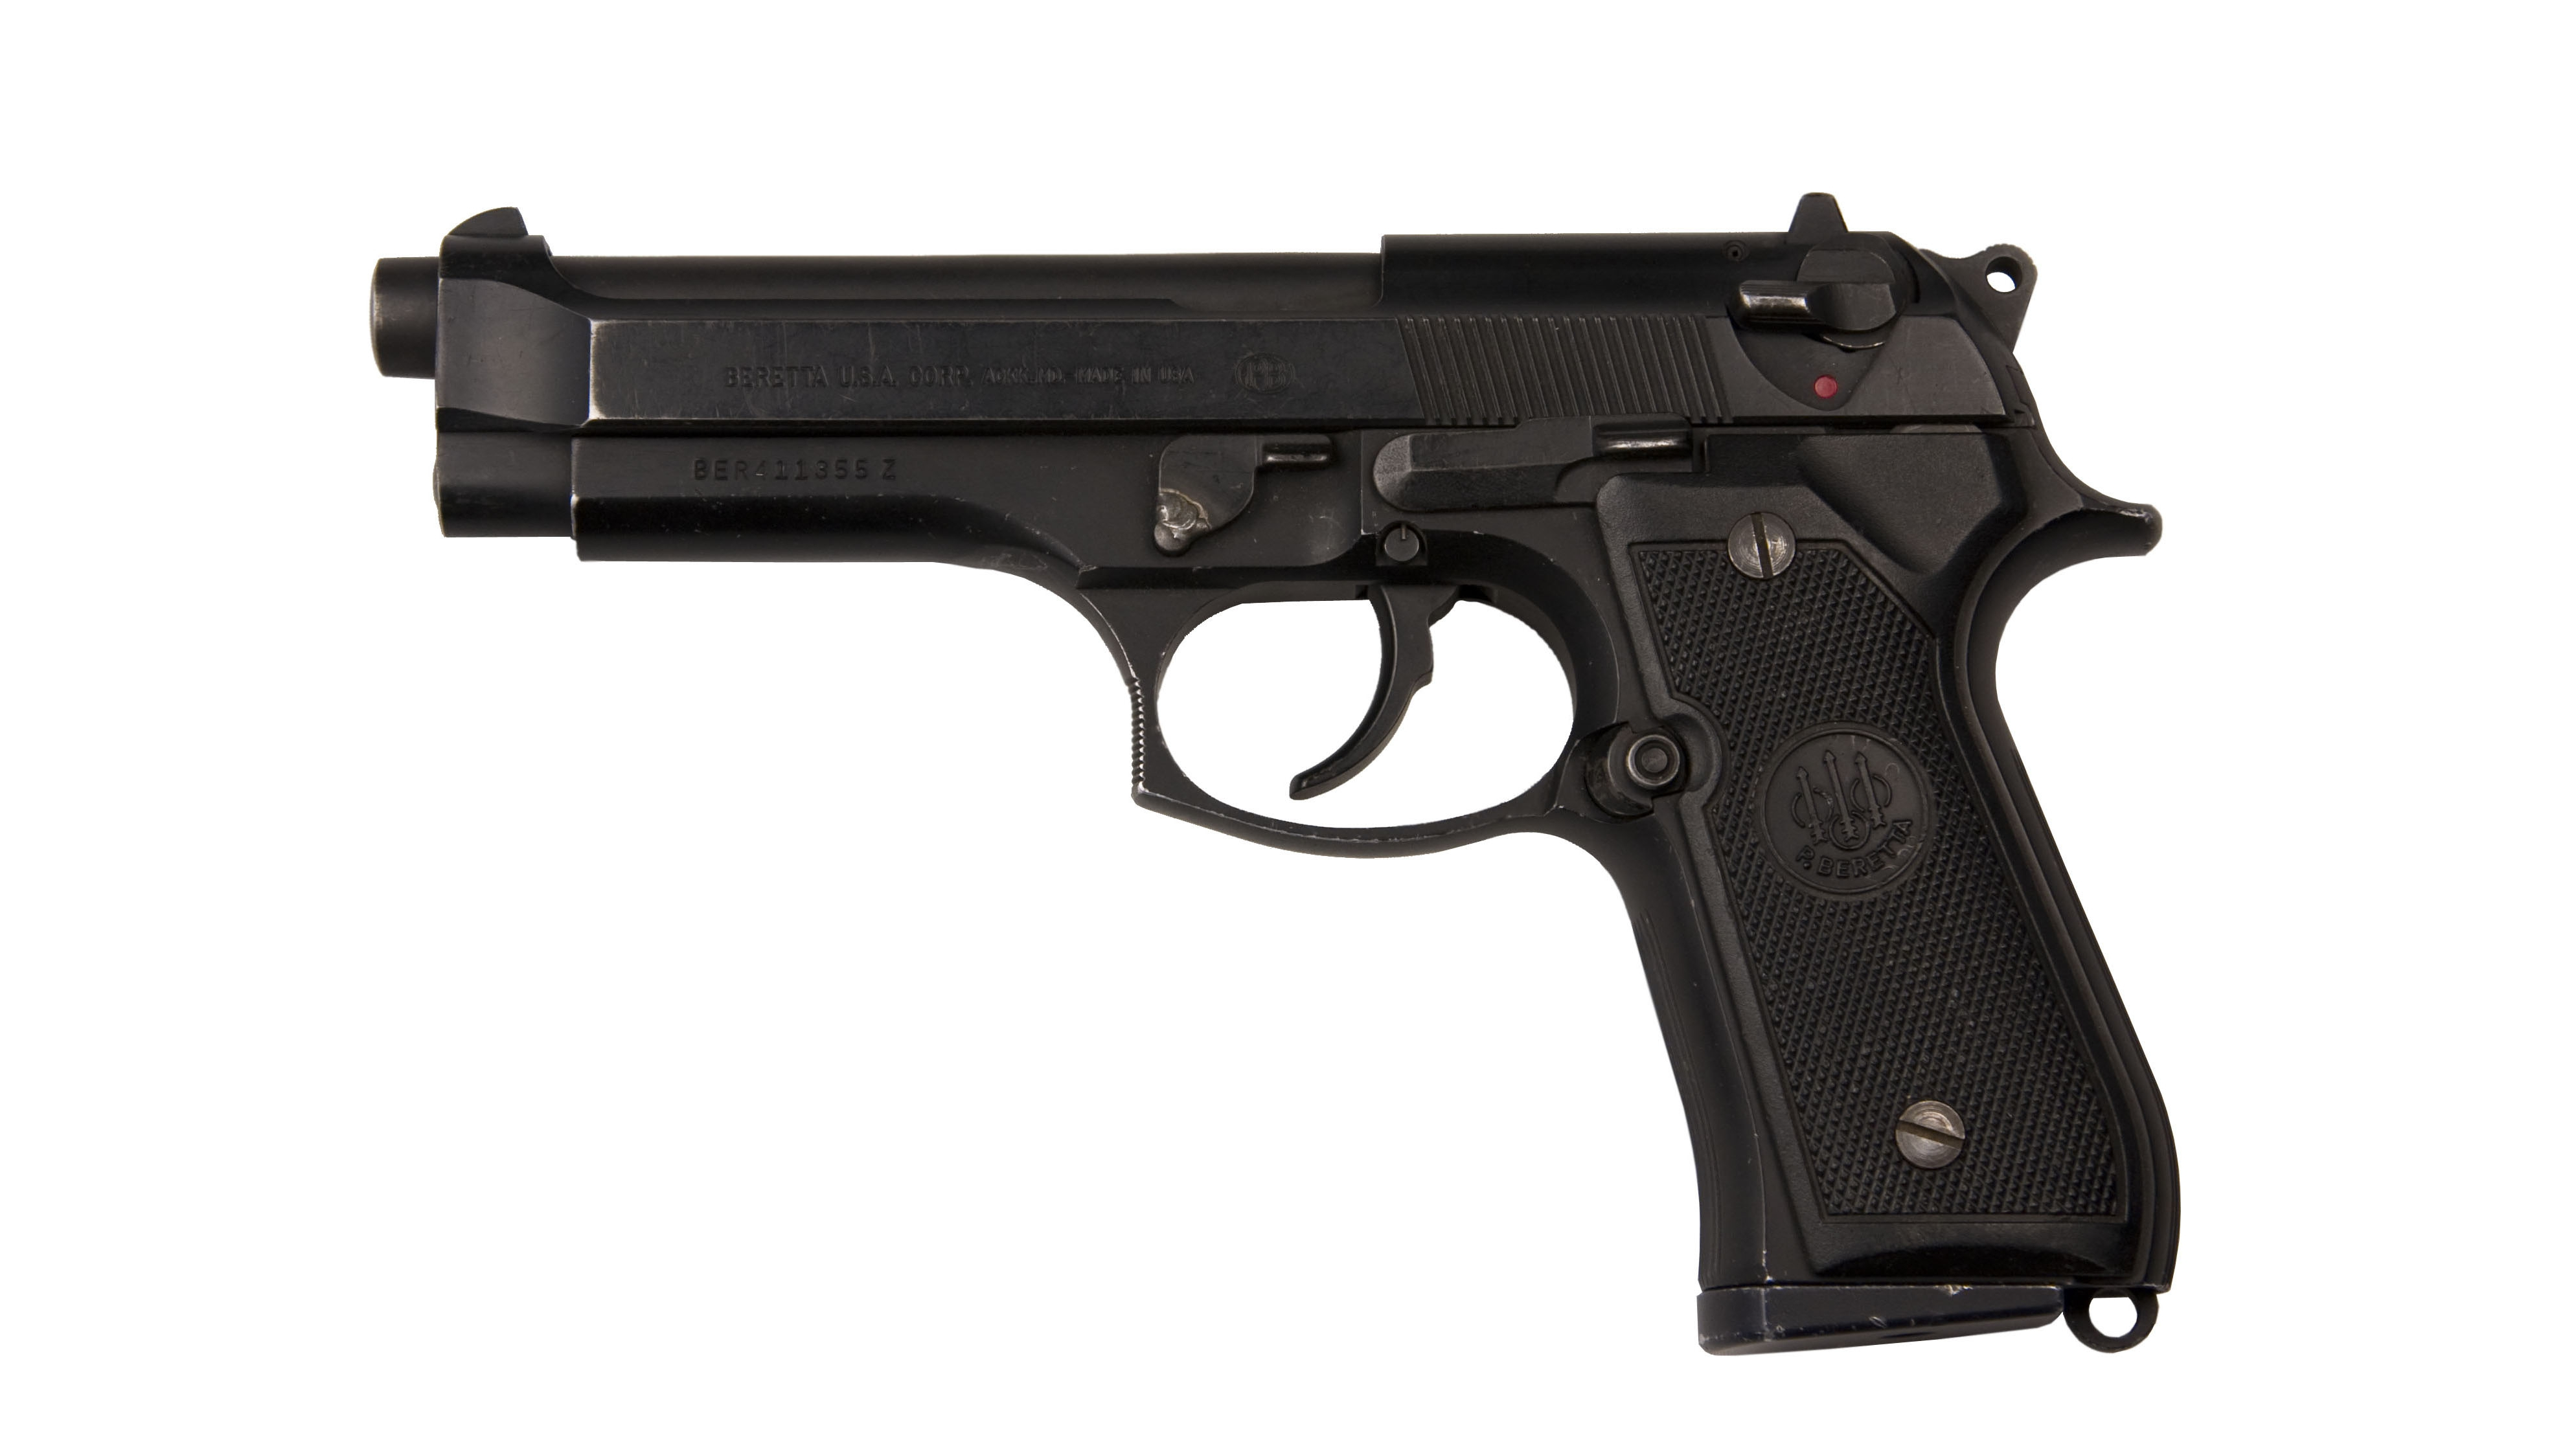 Beretta 92fs Images